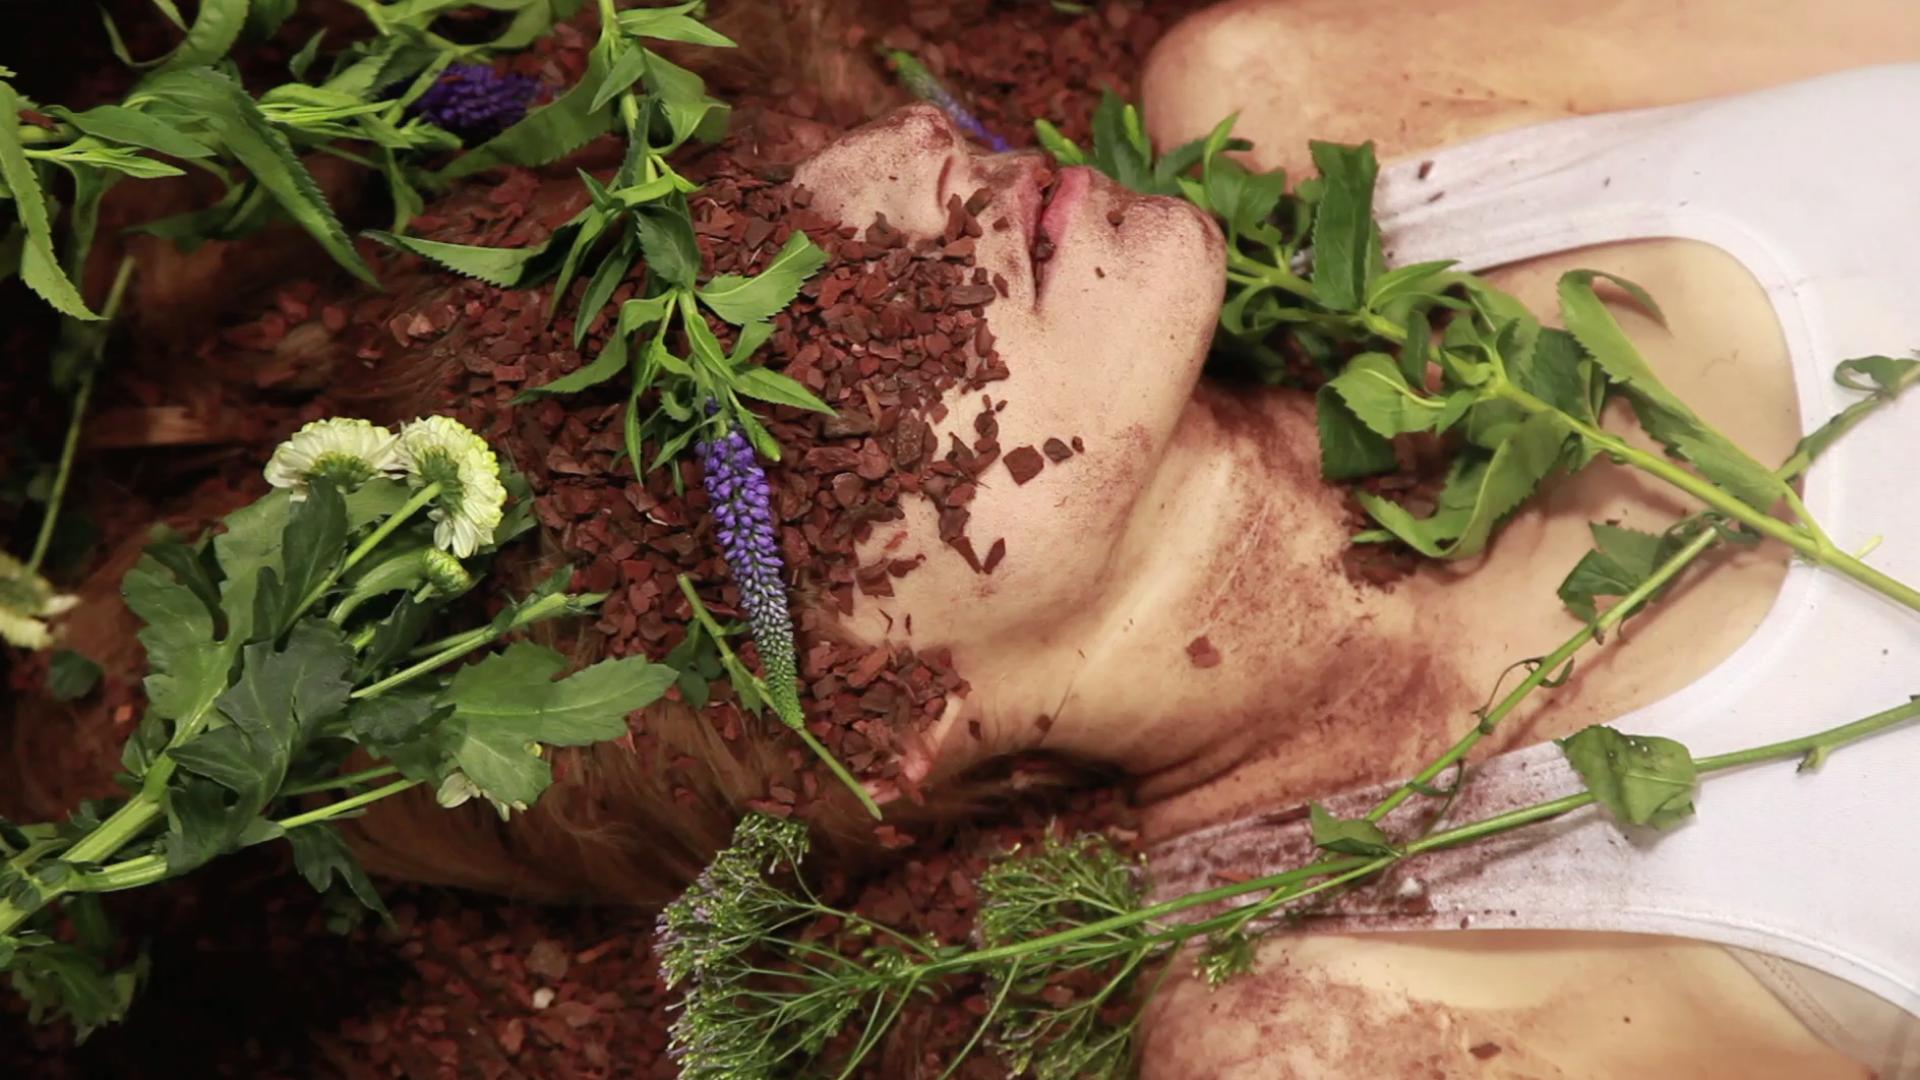 Sarah P. - Dirty Sunday - Video Still